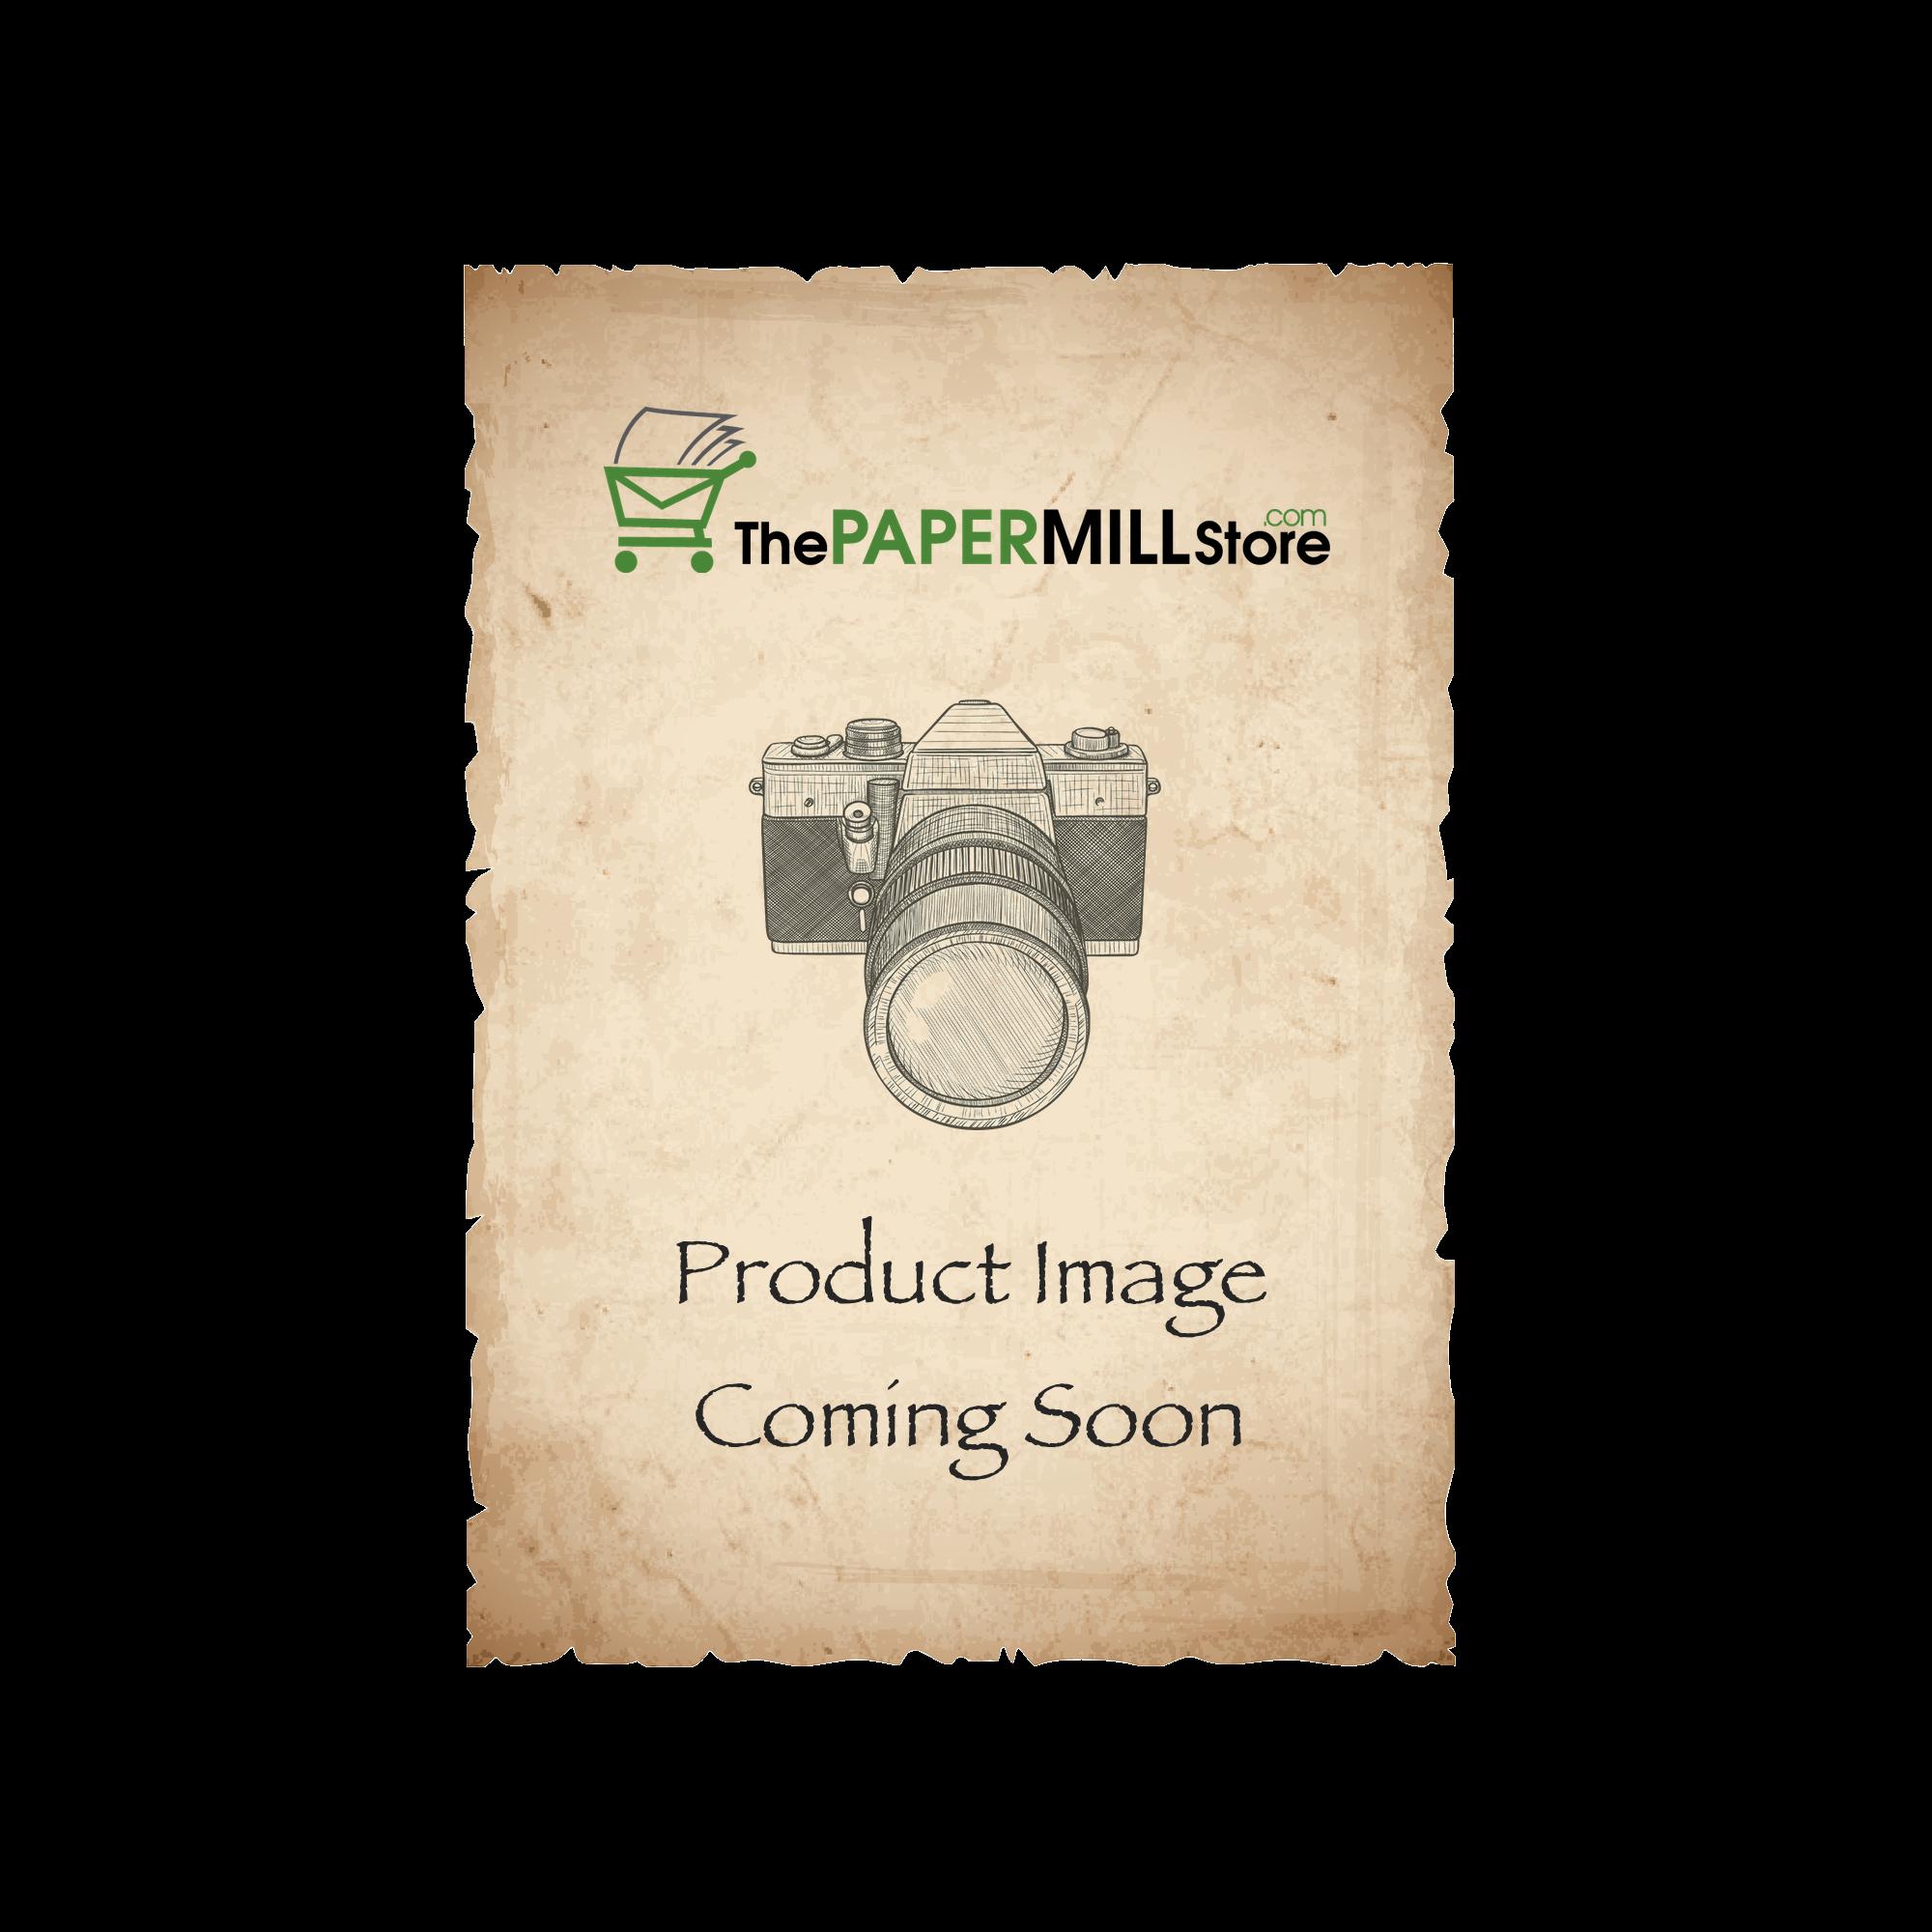 Loop Feltmark Pure White Envelopes - No. 10 Square Flap (4 1/8 x 9 1/2) 80 lb Text Feltmark  30% Recycled 2500 per Carton